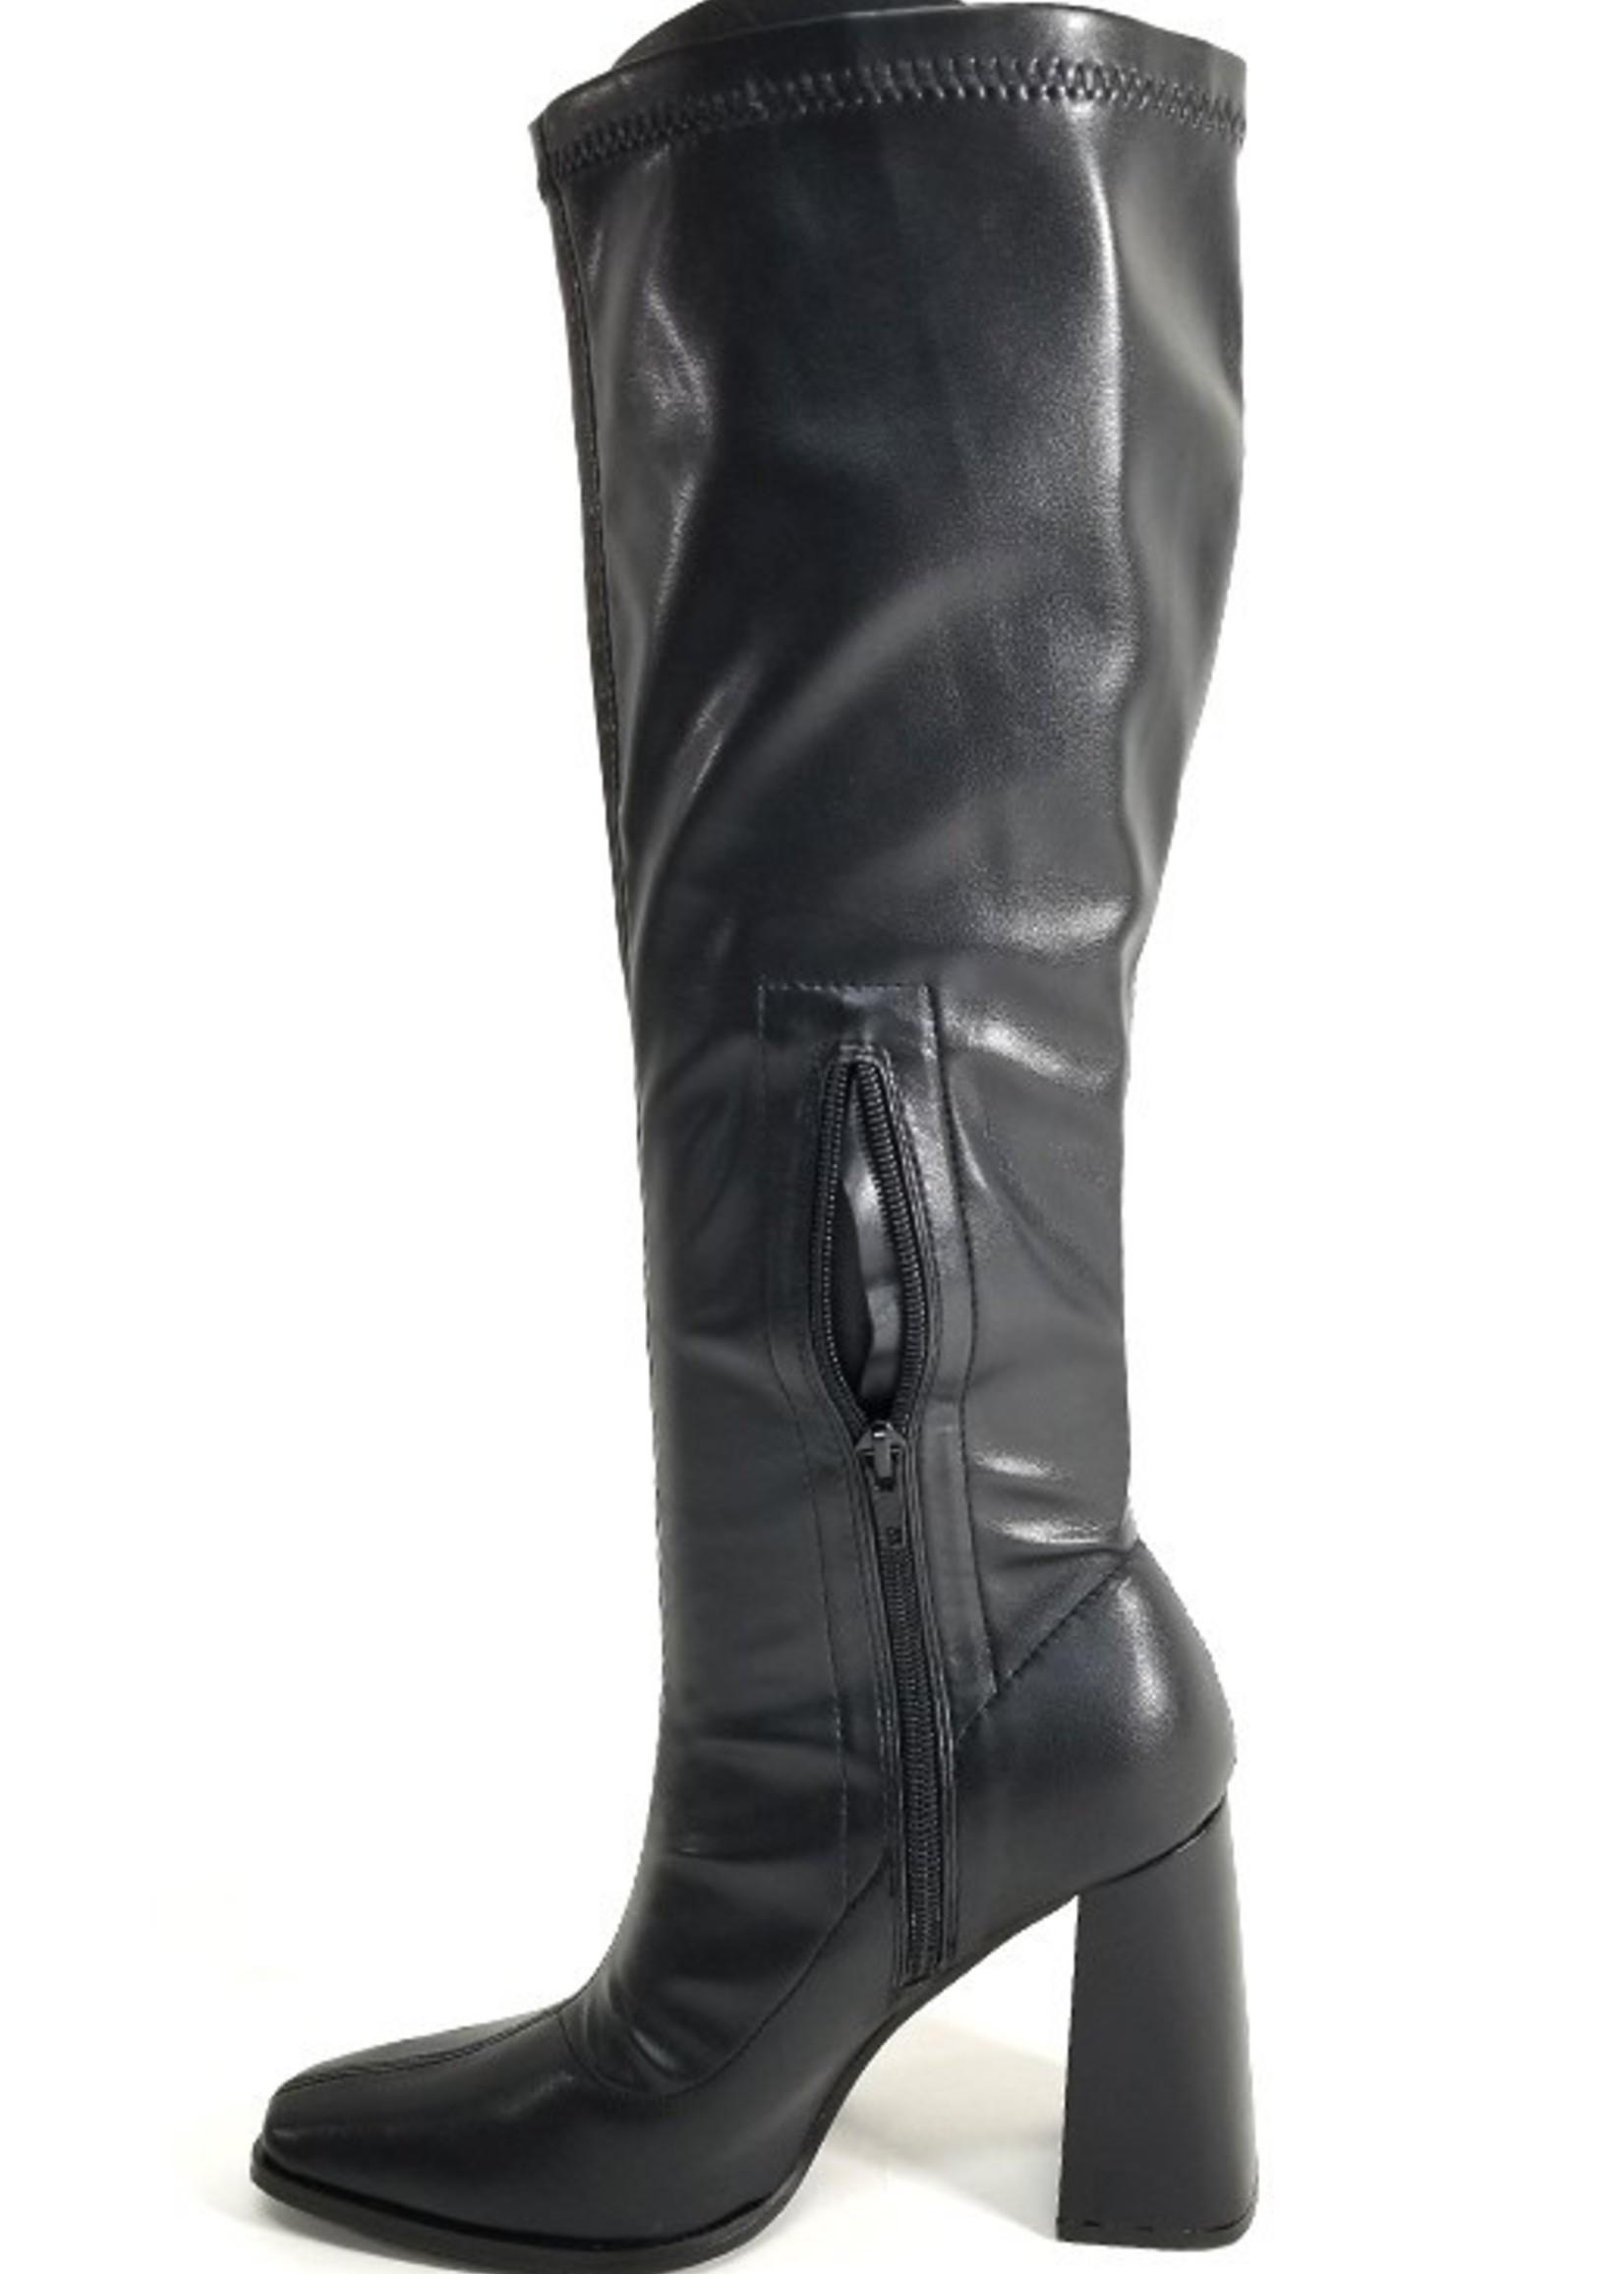 Tall heeled boot